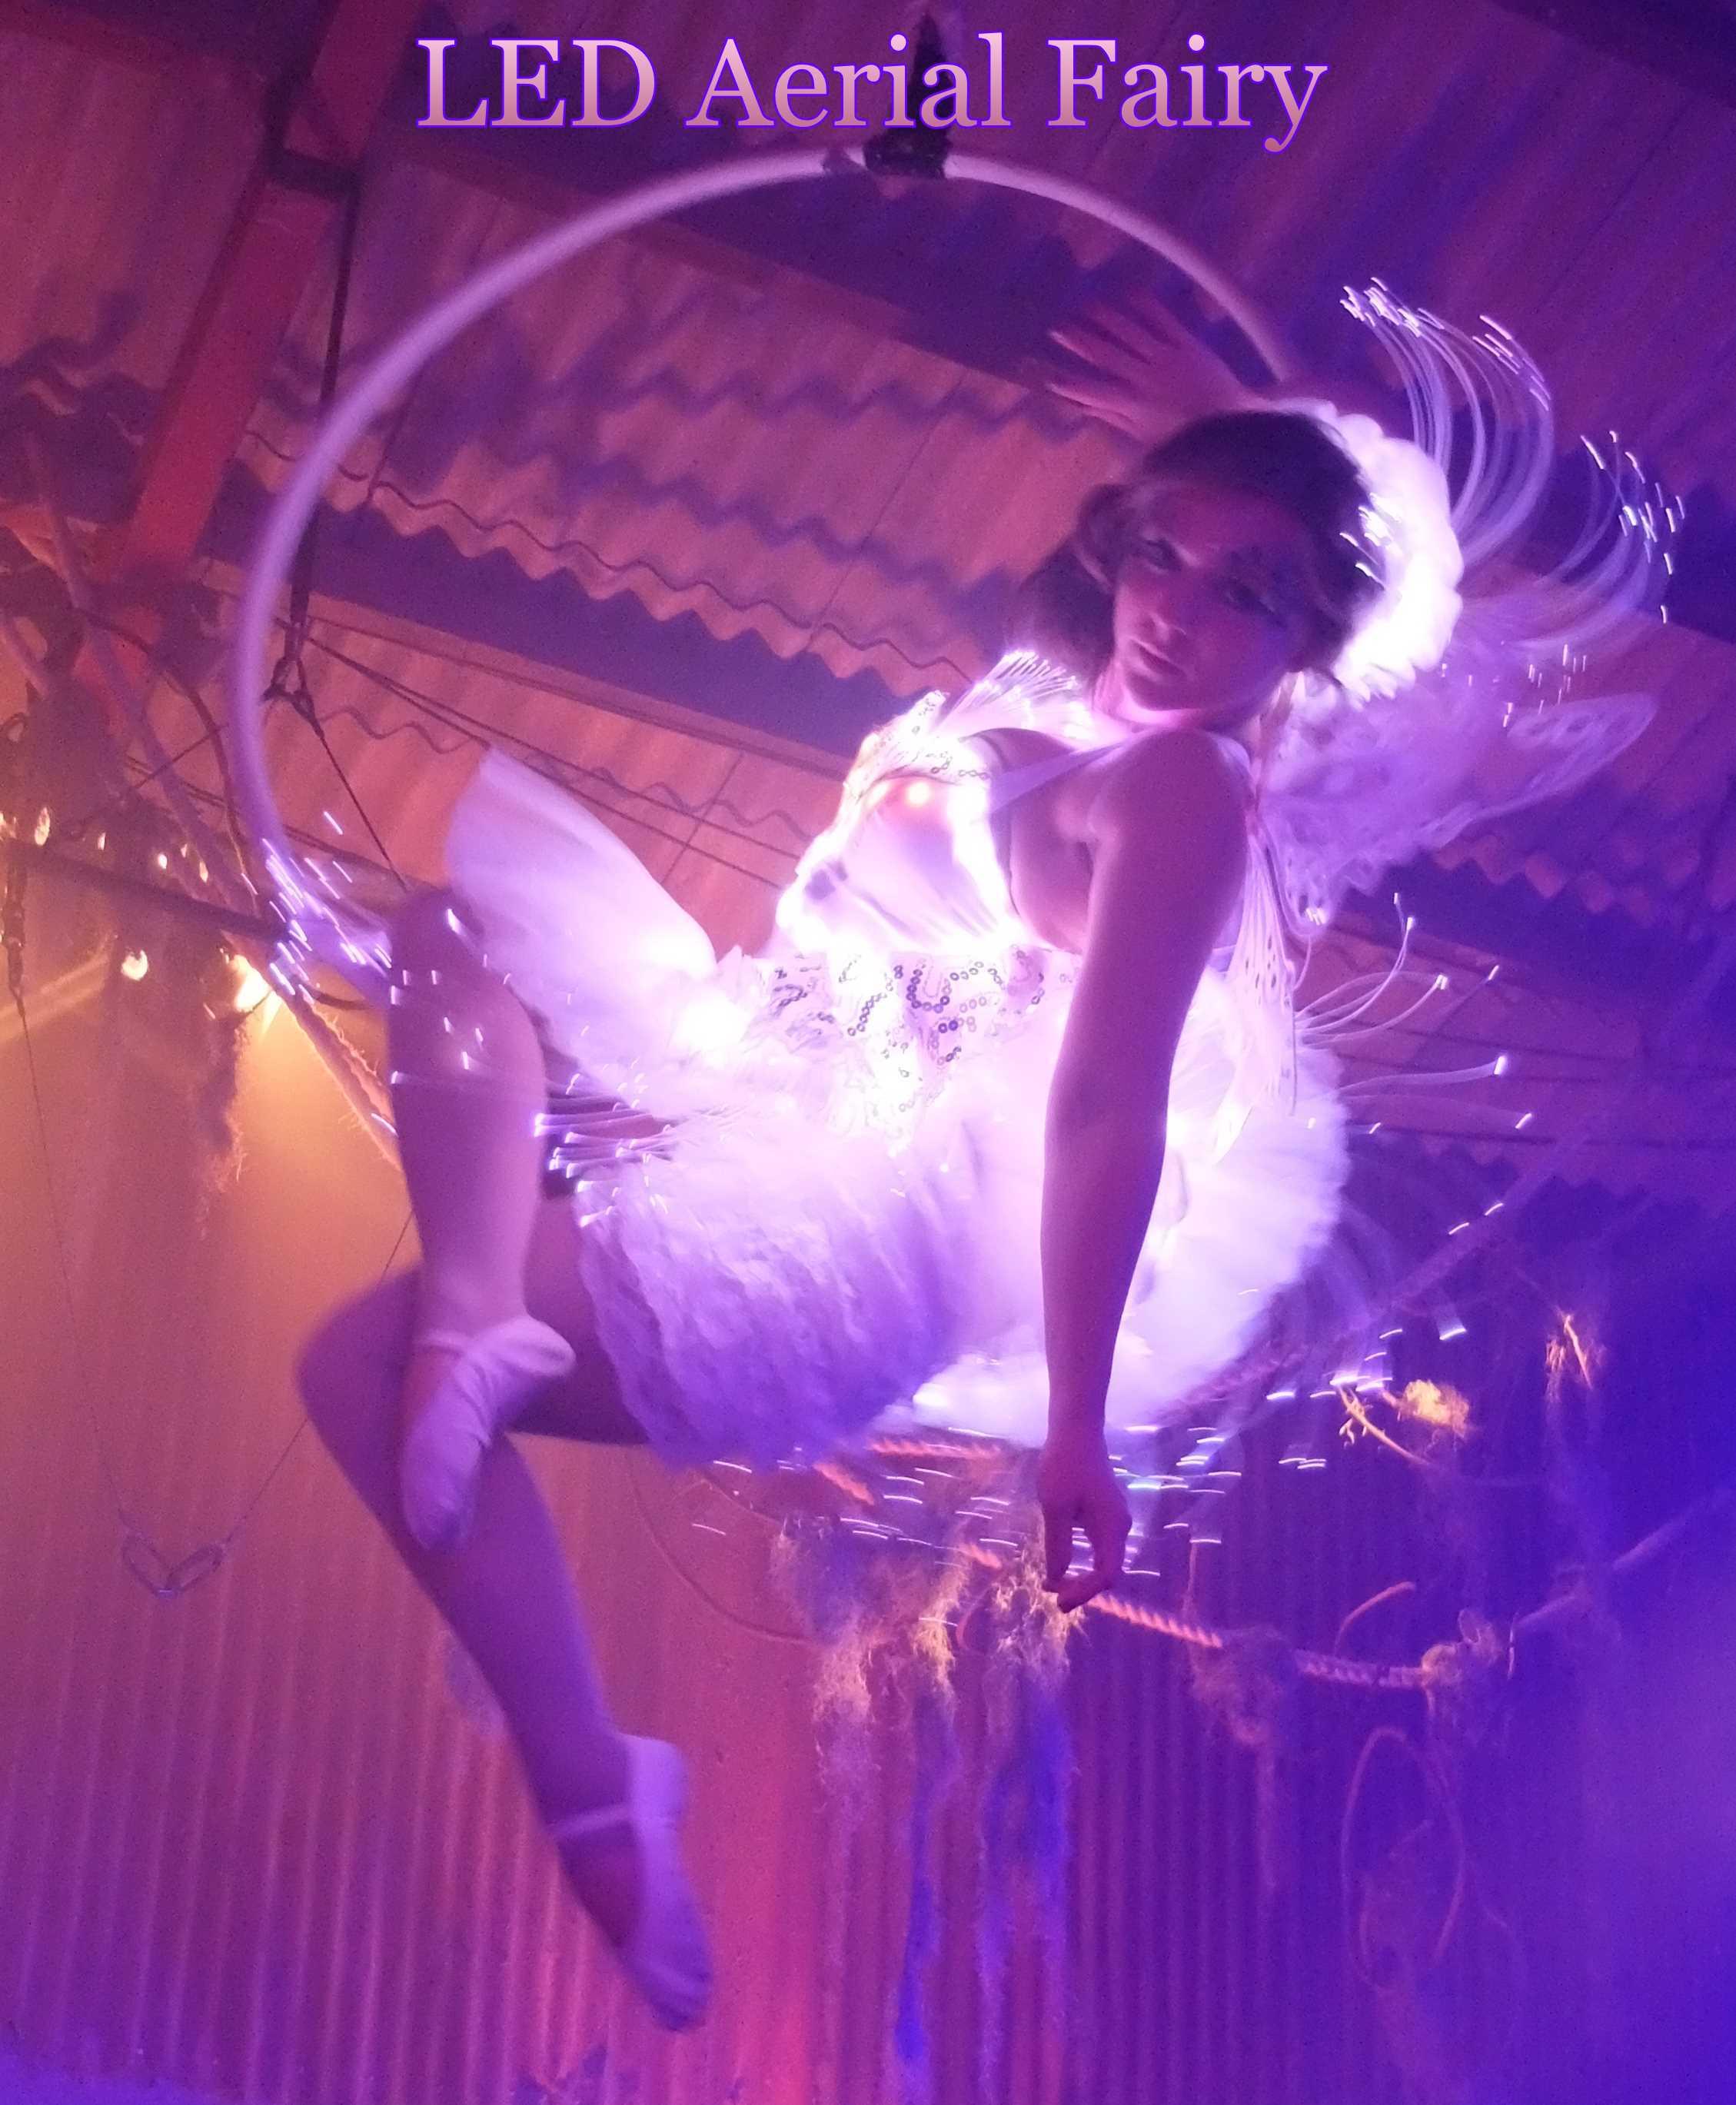 LED Aerial Fairy